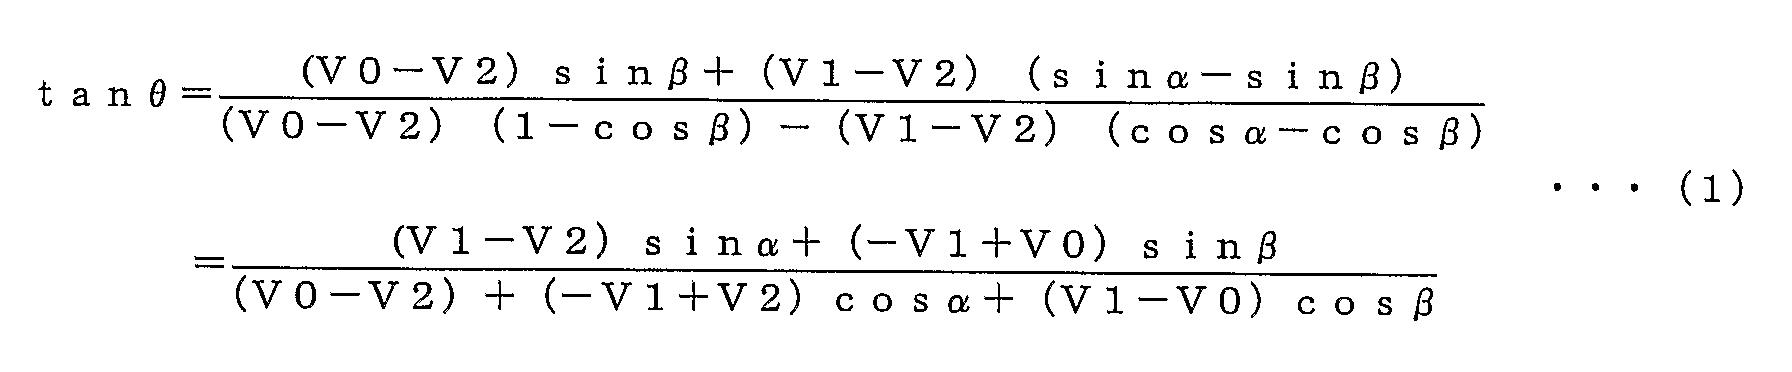 Figure 112004020116187-pct00001